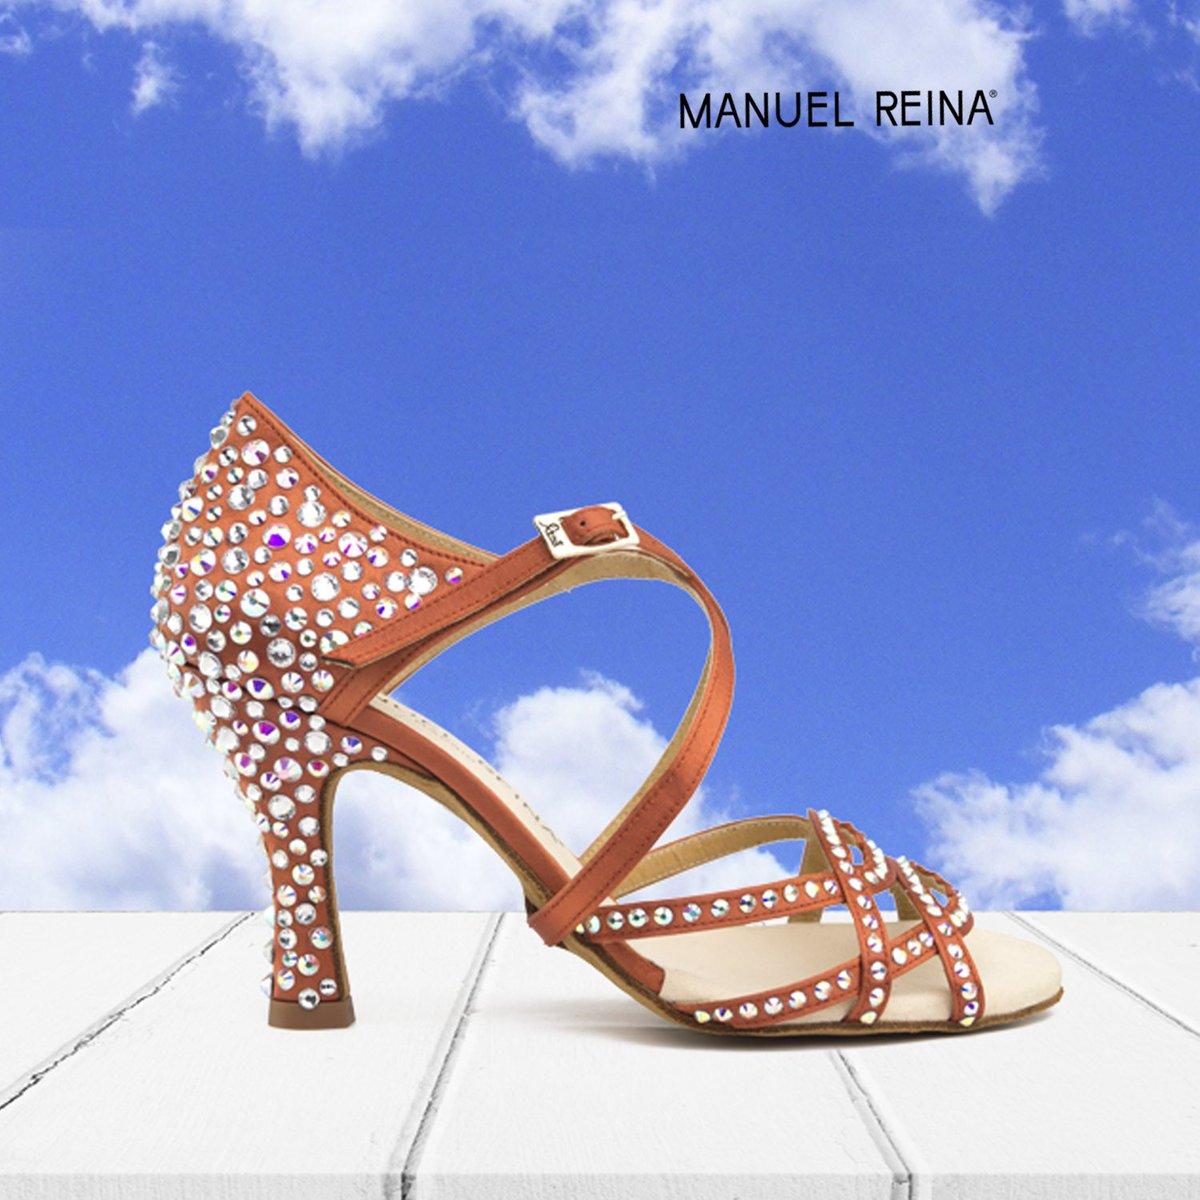 bailar con zapatos Manuel Reina es llegar a tocar las nubes   Mod:Competition 01 Copper LE   Price: 230€  Fabricados a mano  • • • #salsa #bachata #sandals #baile #pumps #danza #merengue #sandal #manuelreina #mnlrnshs #shoes #dance #barcelona #bilbao #madrid #bailarpic.twitter.com/twnLt77F6q